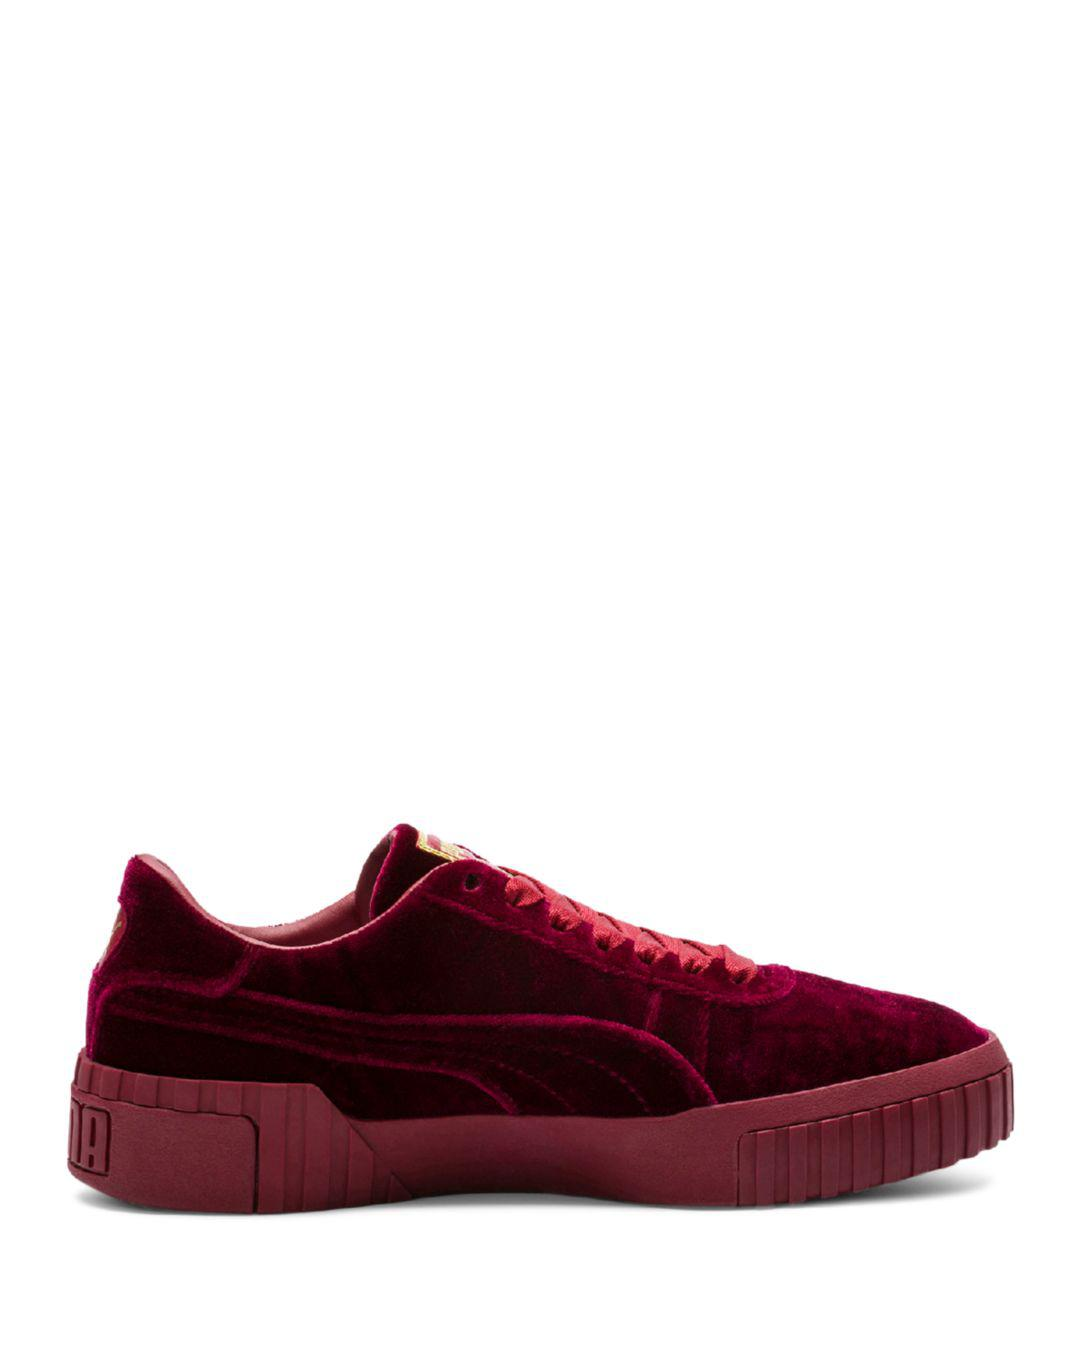 d5a3b830c33 Lyst - PUMA Women s Cali Velvet Low-top Sneakers in Red